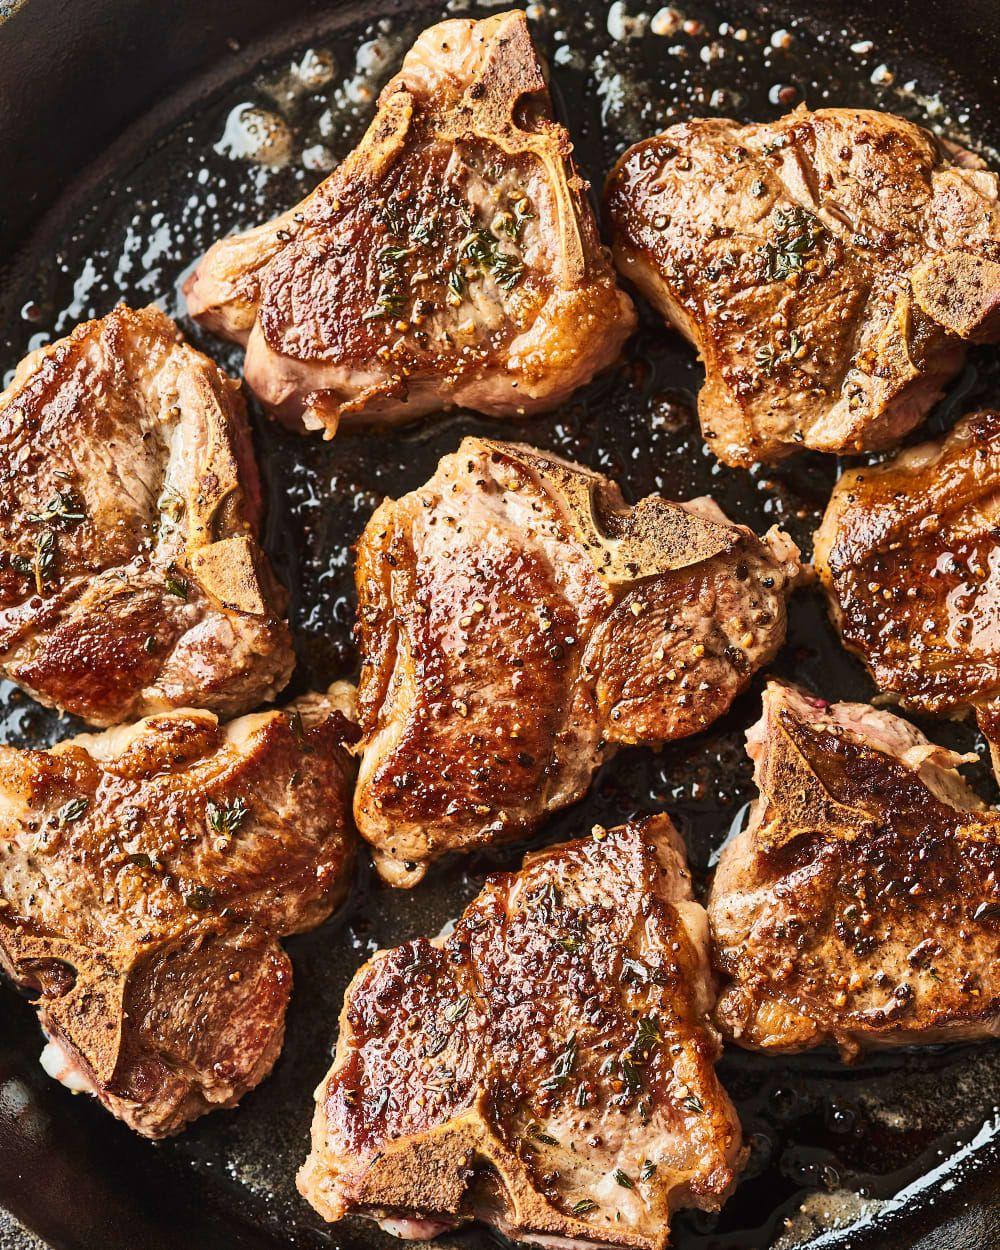 lamb chops recipe emeril How To Cook Lamb Chops